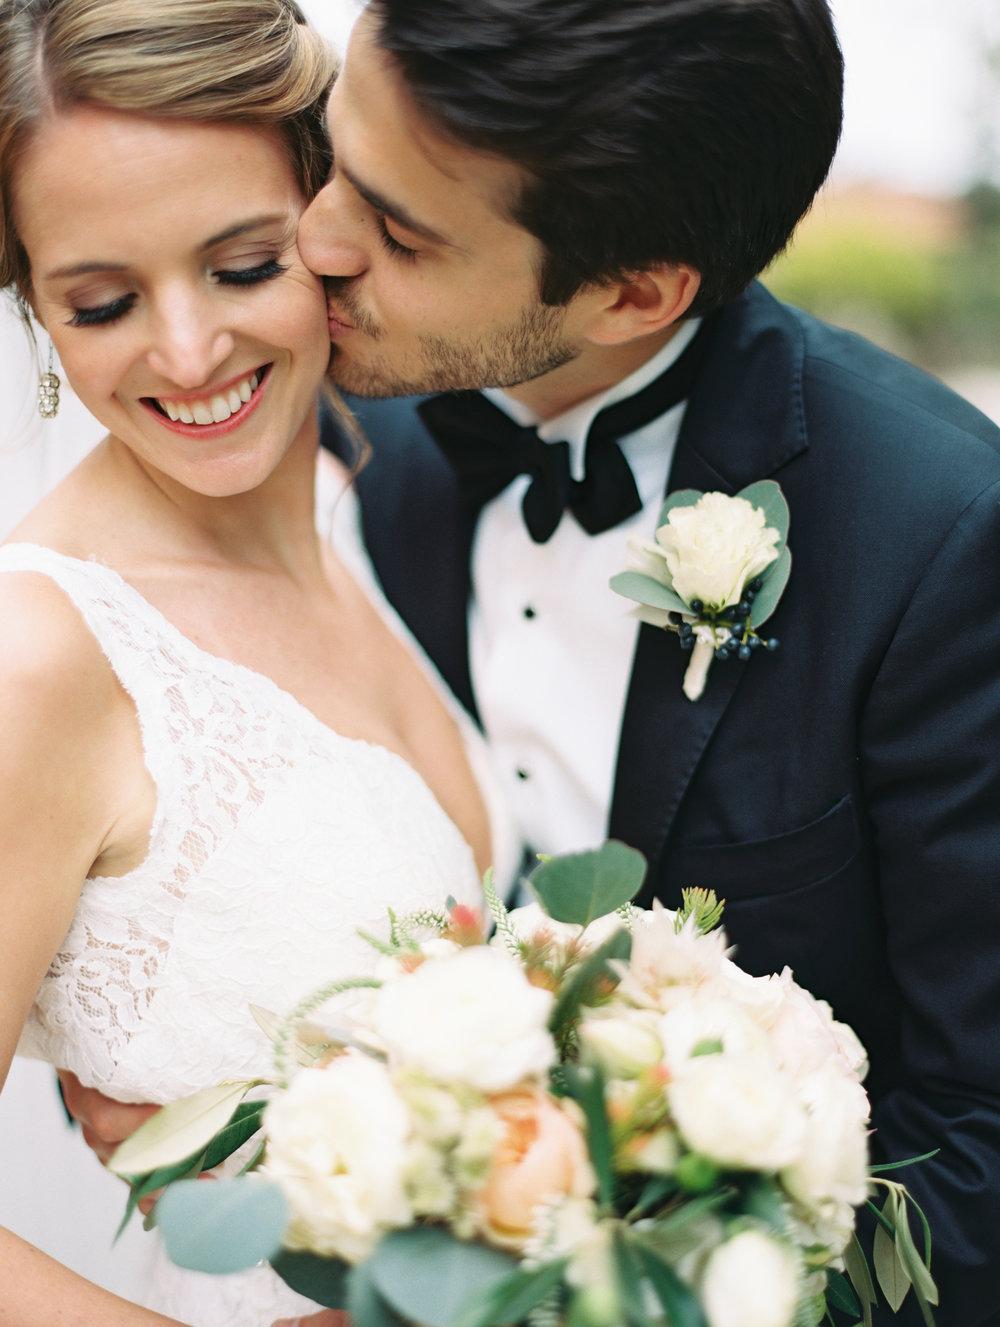 522-fine-art-film-photographer-carmel-california-destination-wedding-brumley-wells-tim-courtney.jpg